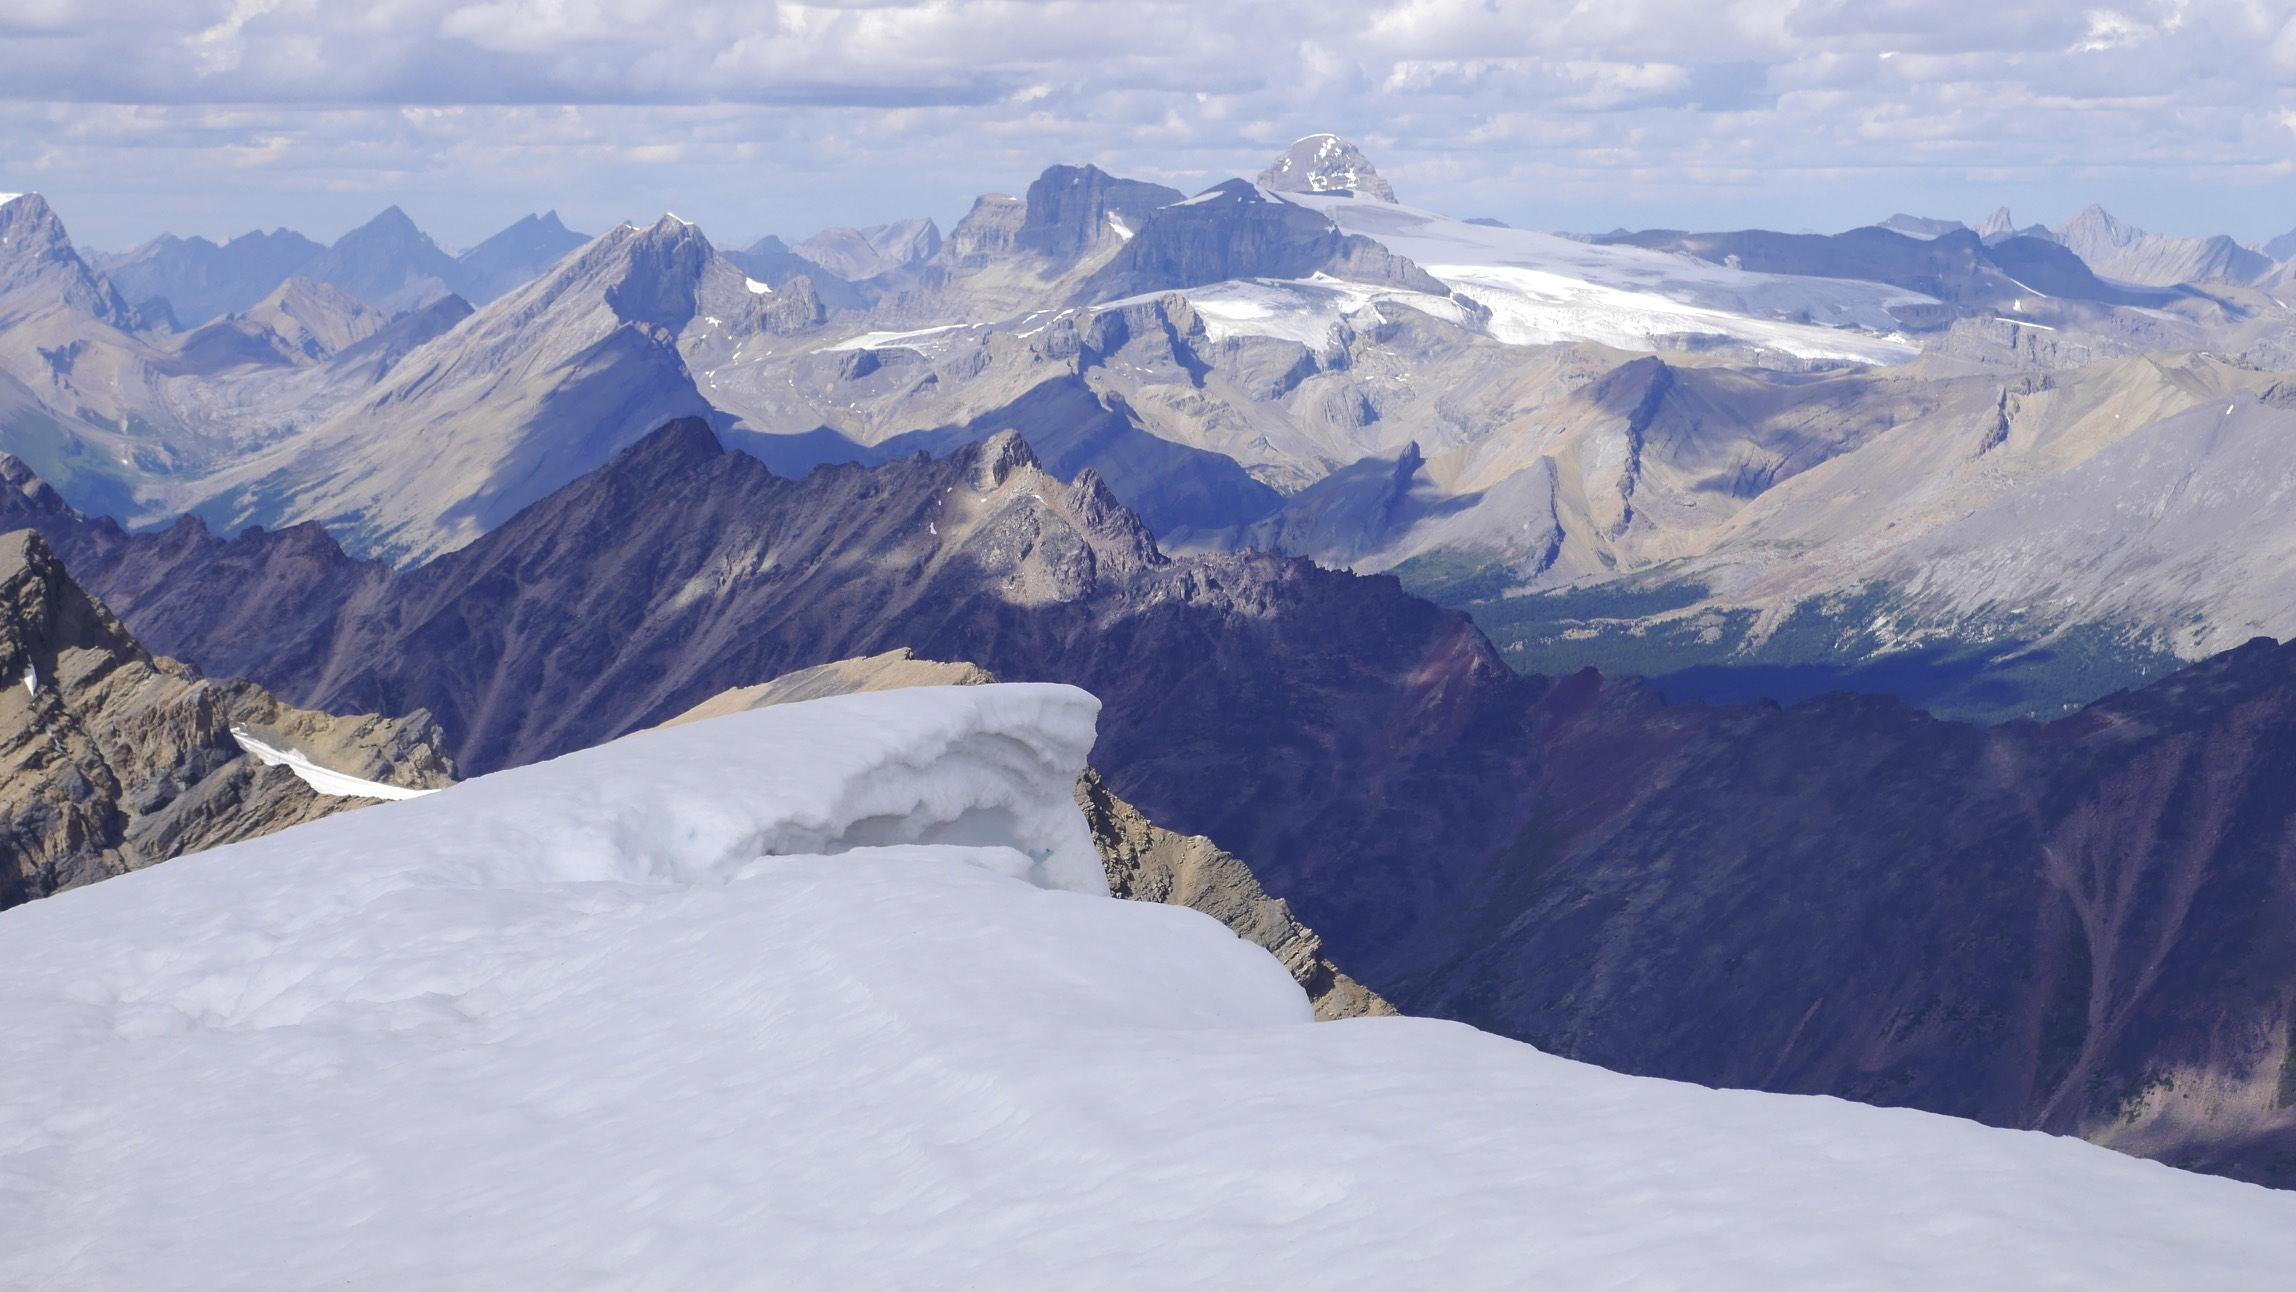 View to Mt. Brazeau (high peak in the centre) from Sunwapta Peak 3,315m